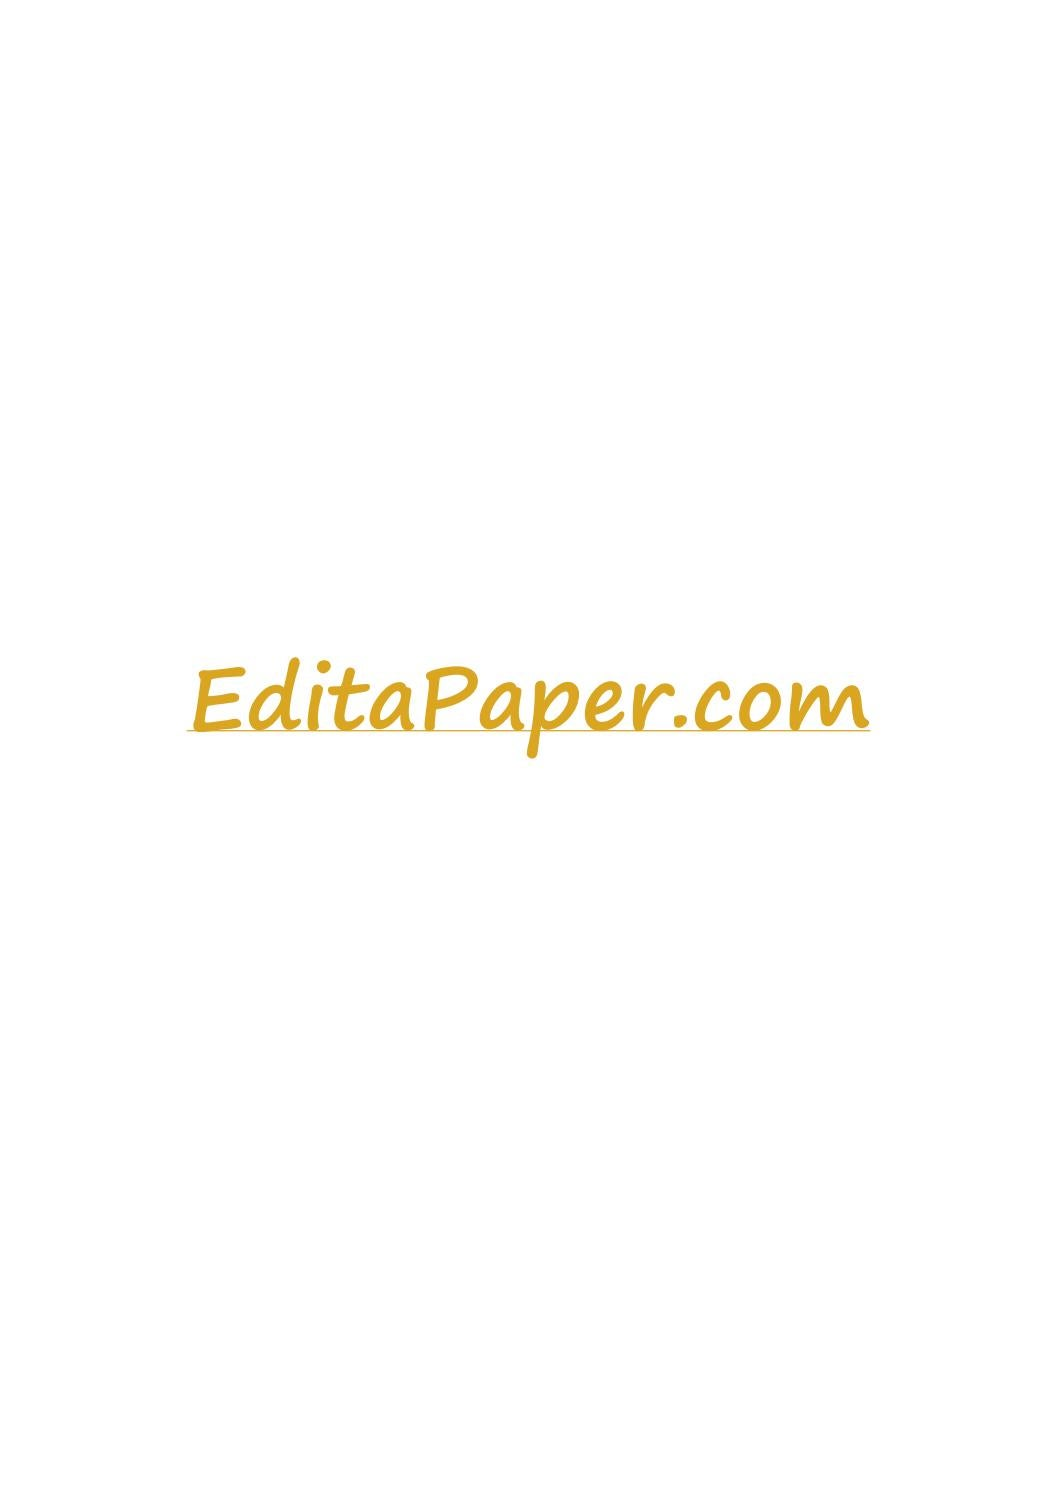 Cheap critical thinking writing websites gb